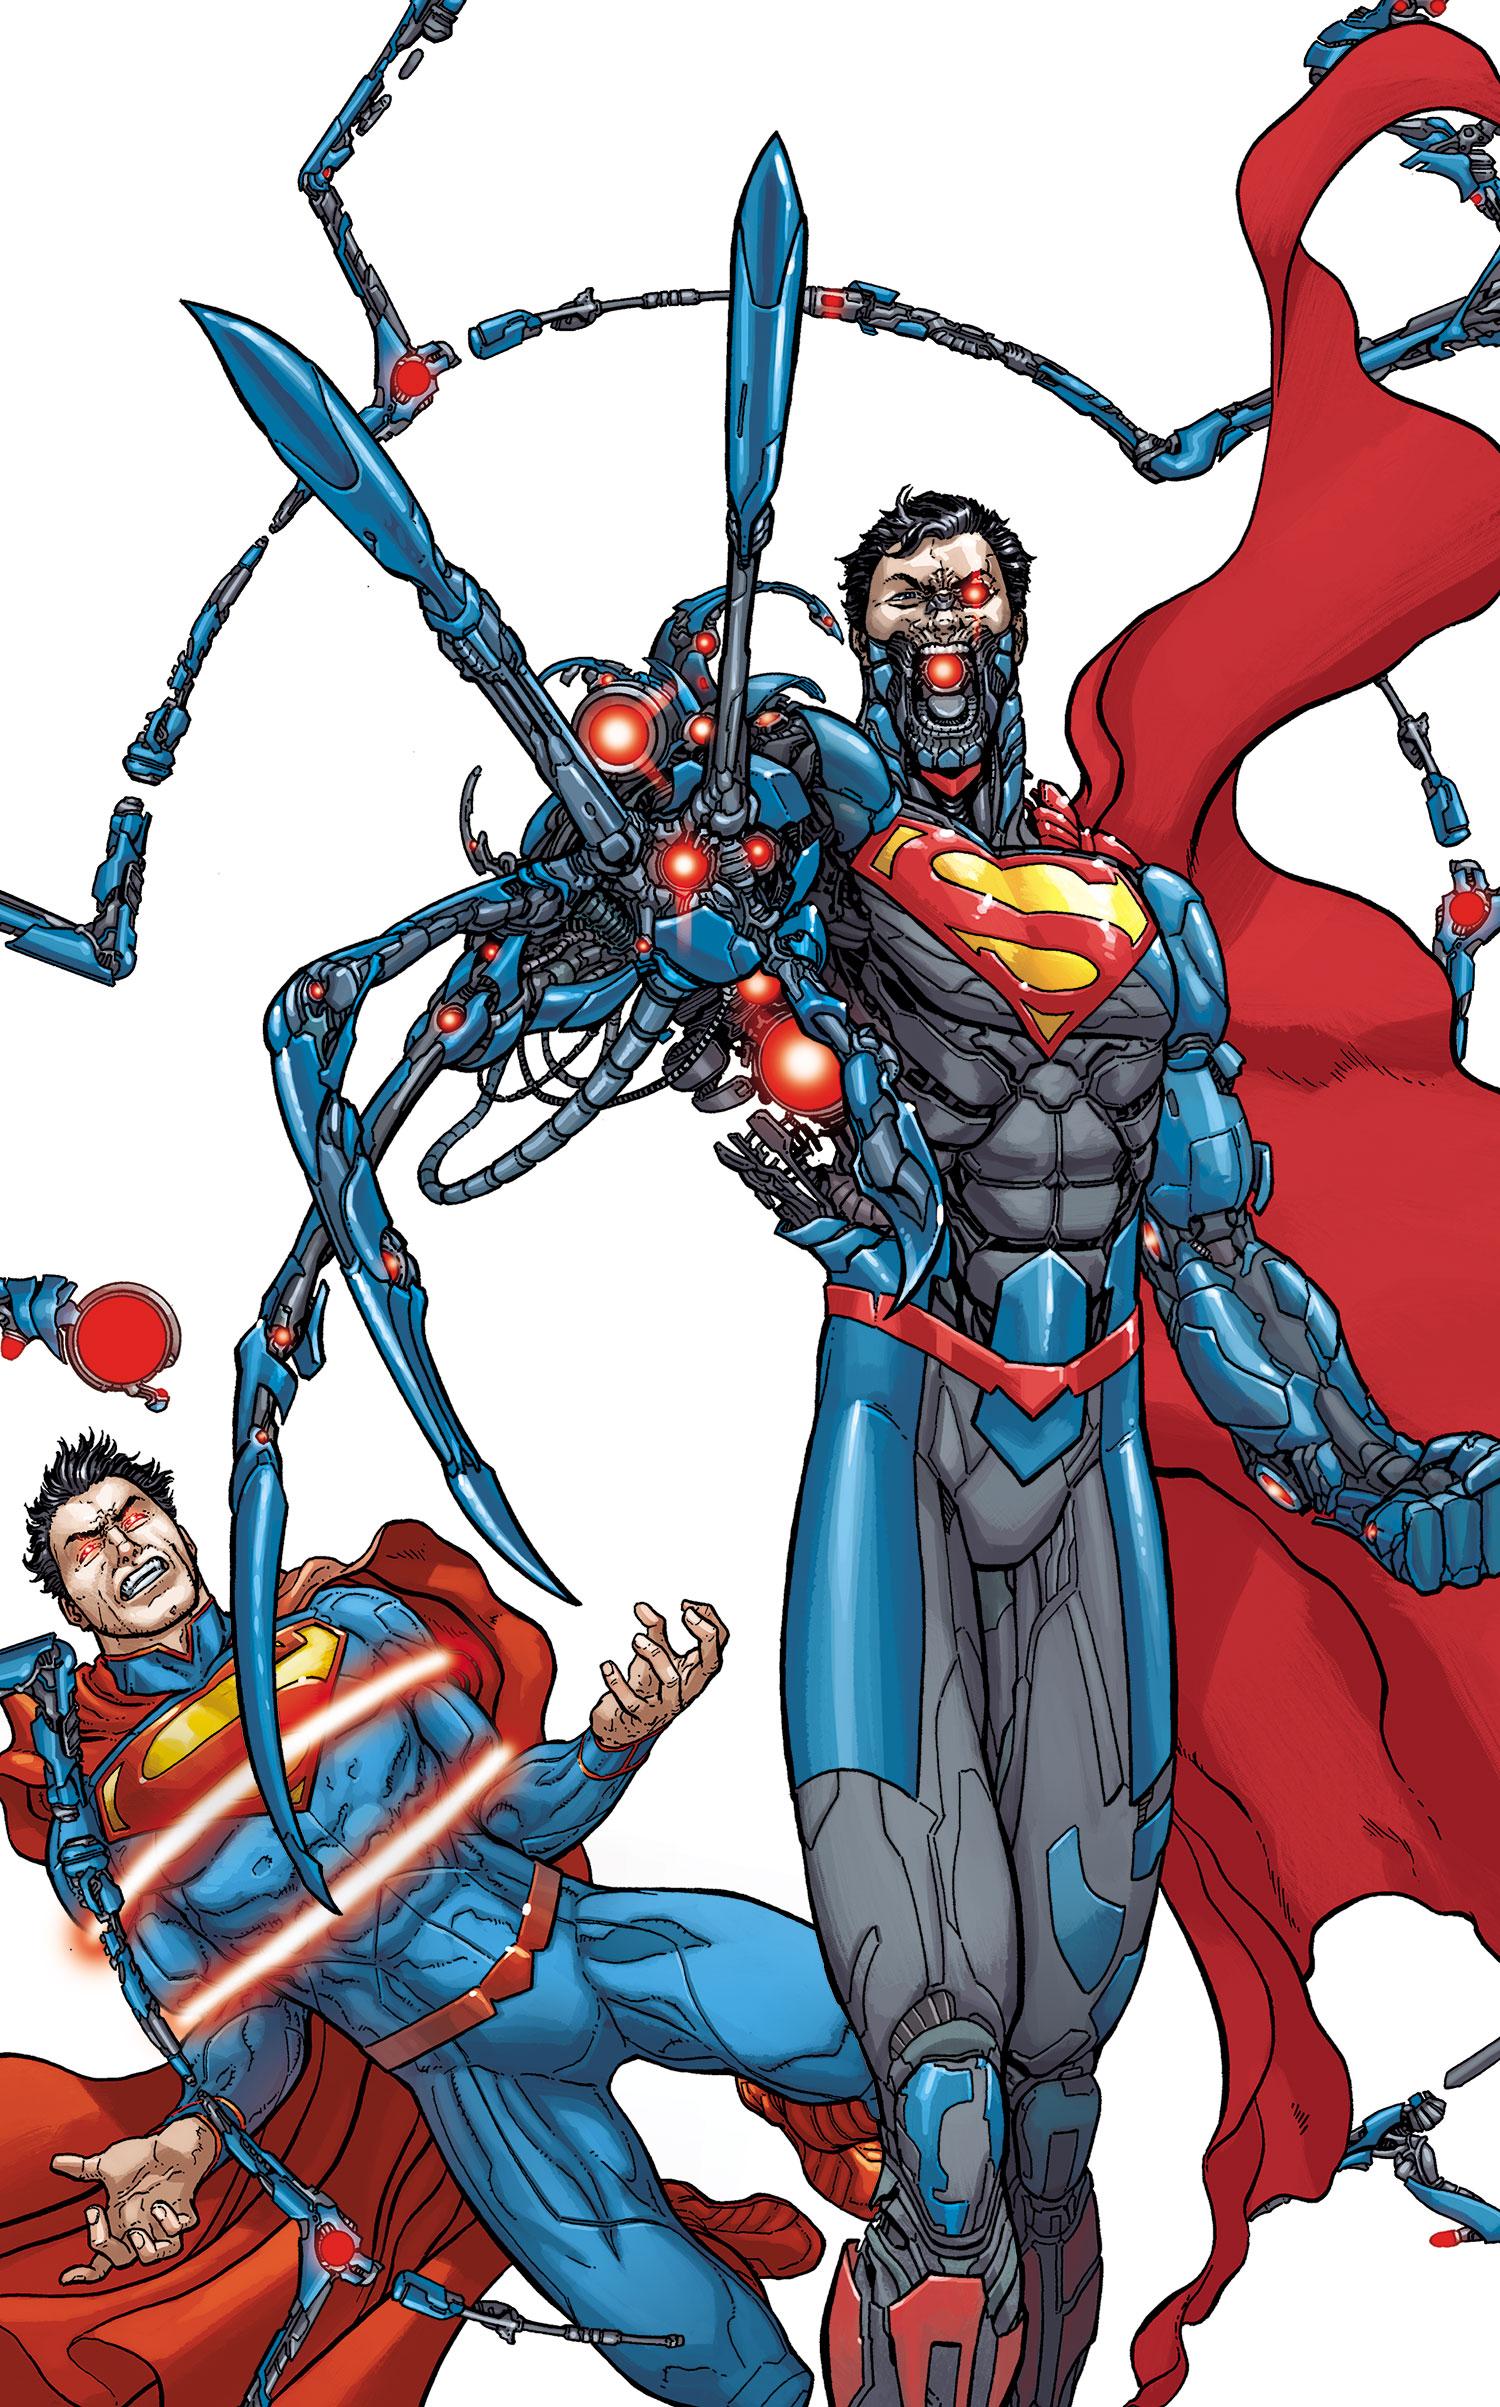 Action Comics Vol 2 23.1 Cyborg Superman Textless